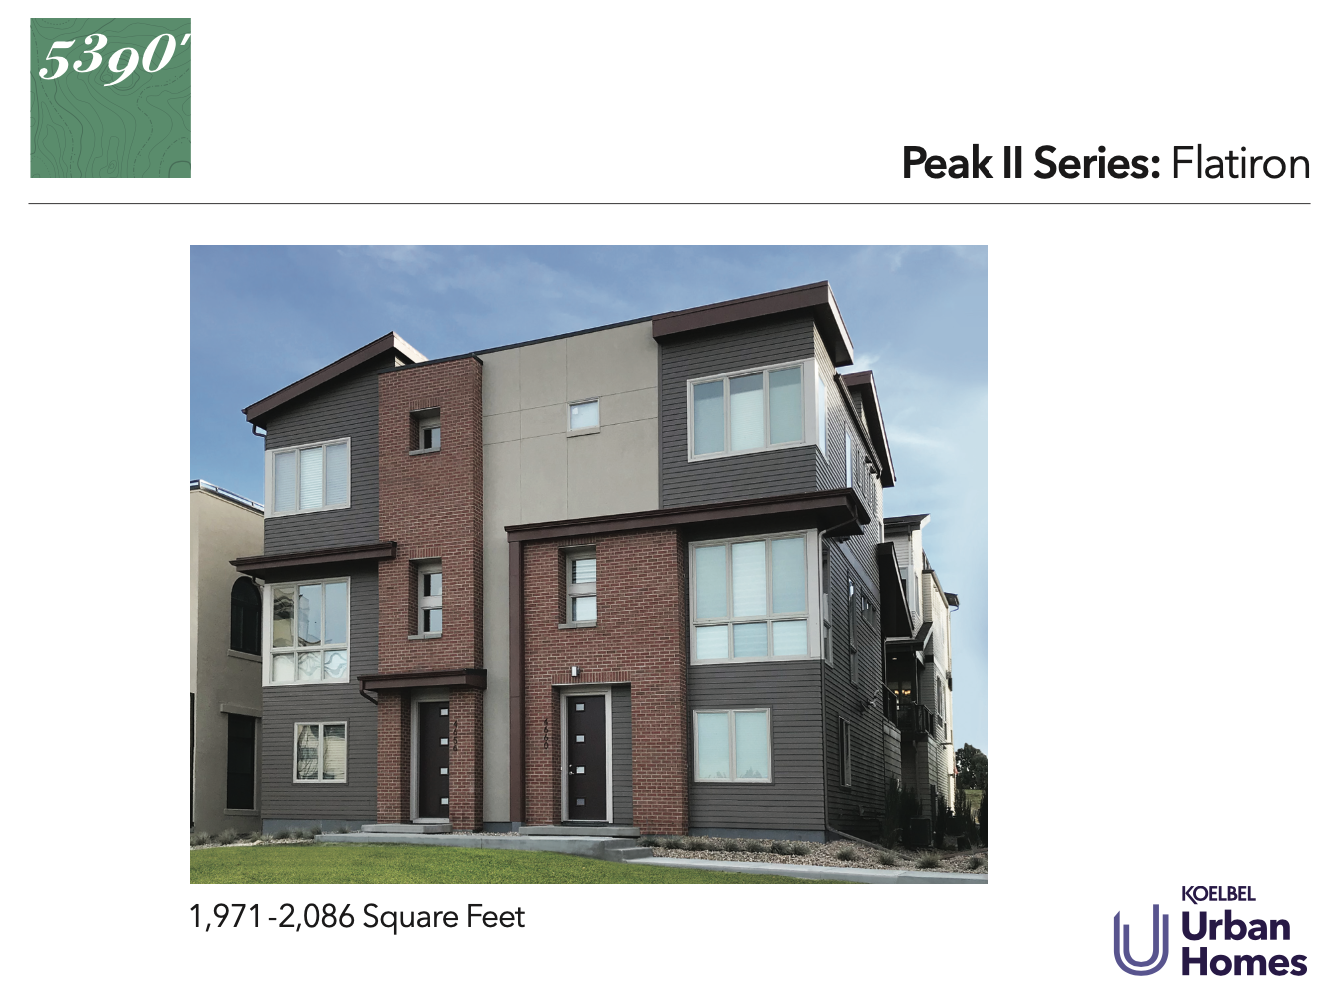 5390' Community by Koelbel in the Berkeley Tennyson Neighborhood Denver New Construction Homes For Sale Peak II Flatiron Elevation